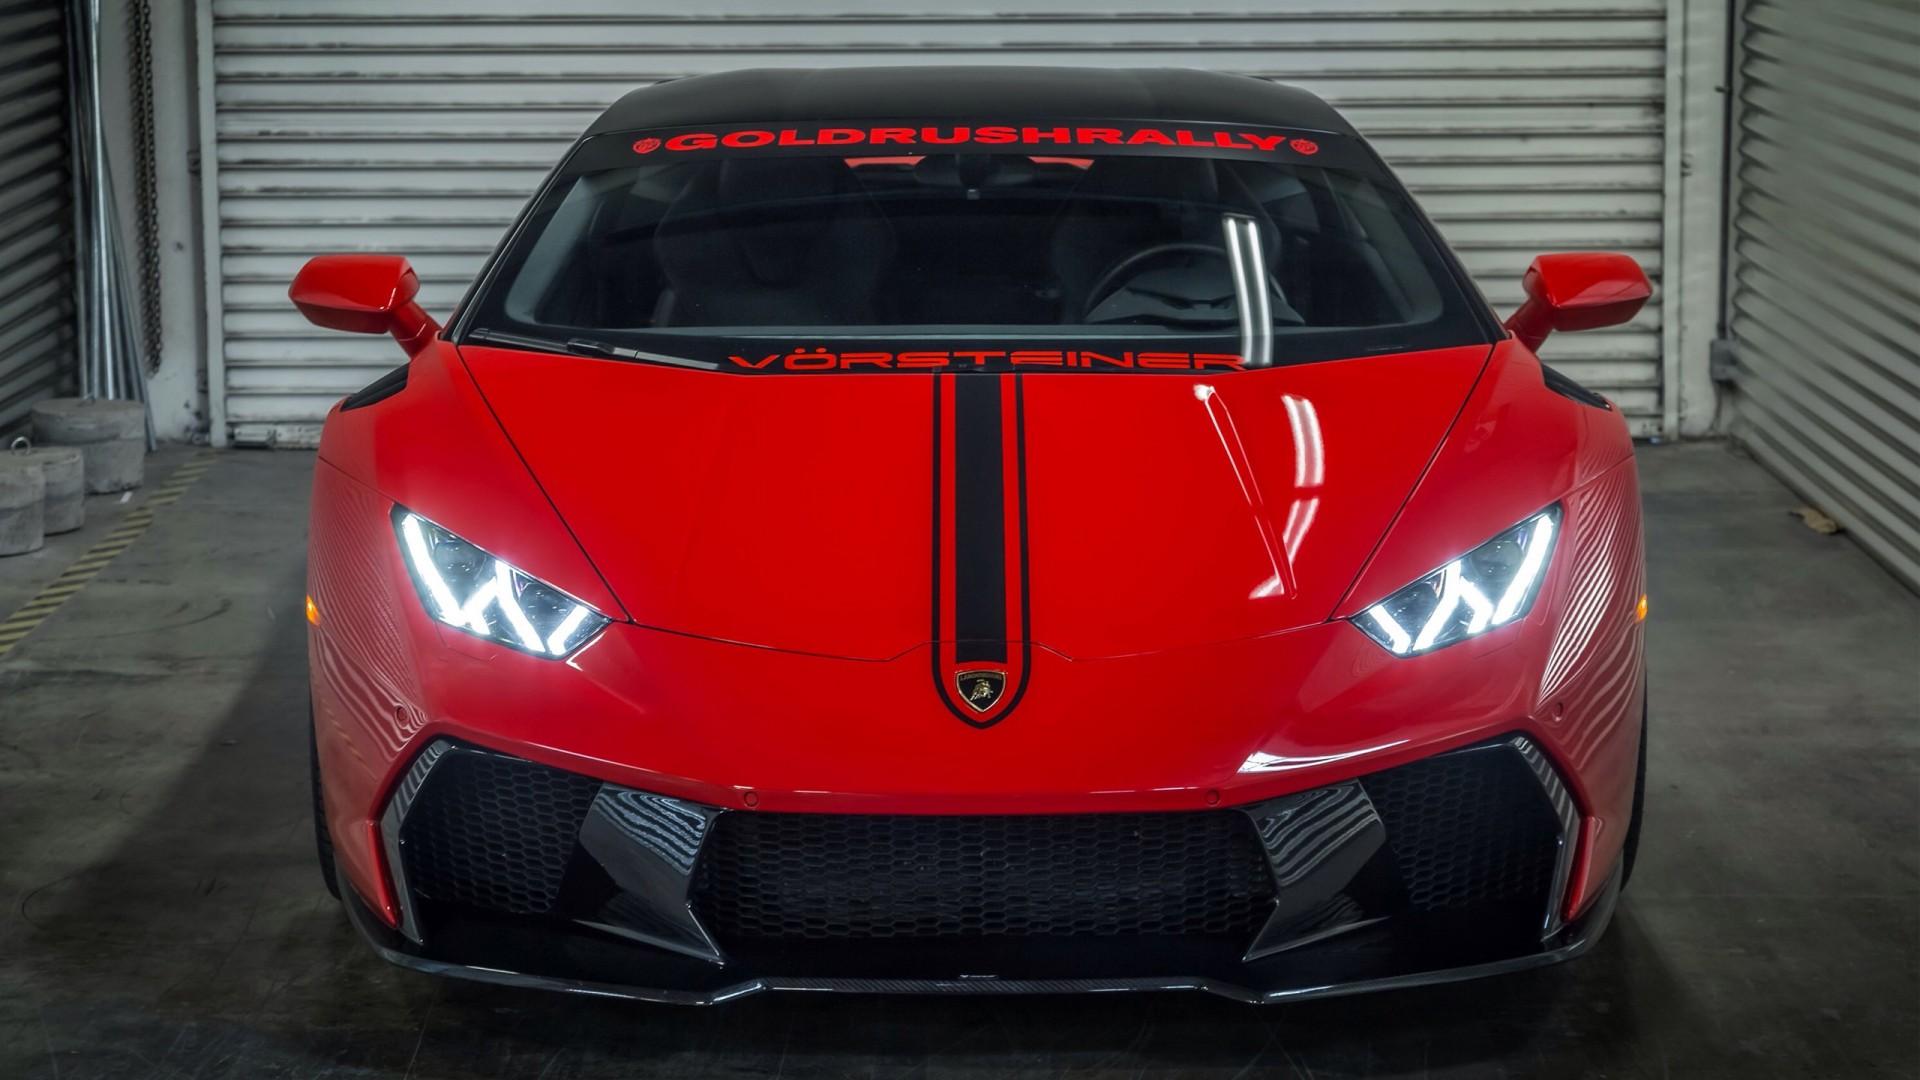 Sports Car Wallpaper Lamborghini 3d Vorsteiner Lamborghini Huracan Novara 2016 Wallpapers Hd